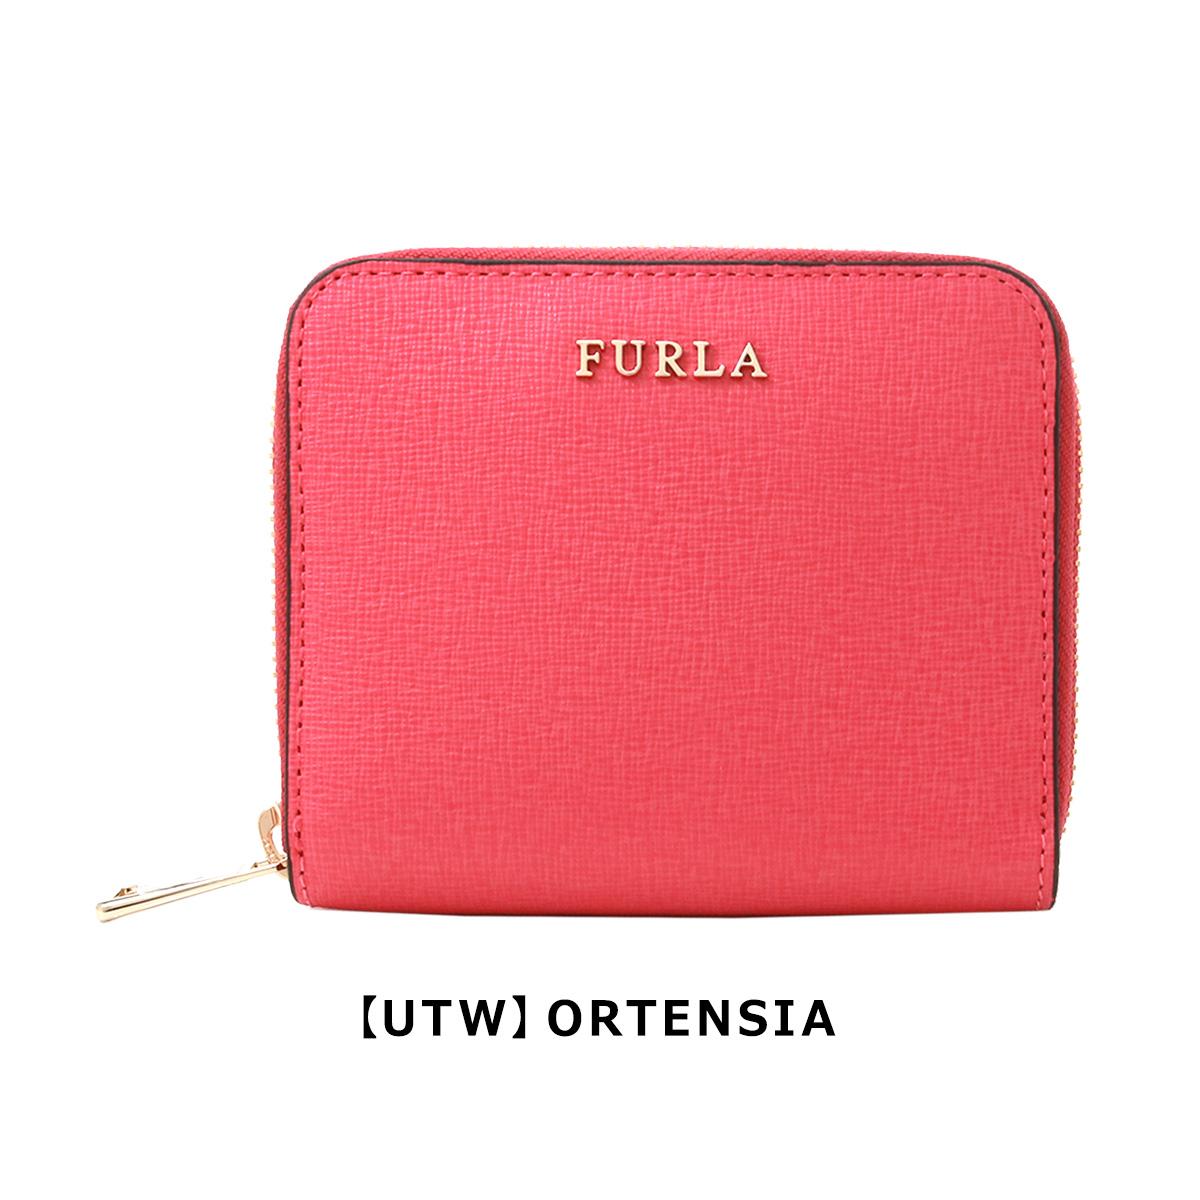 3840b9596093 FURLAのラウンドファスナー財布をご紹介。上質なカーフレザーは美しく艶のある色合いと、キズや汚れに強い型押しが施されたハリのある質感が魅力。 ゴールドファスナー ...